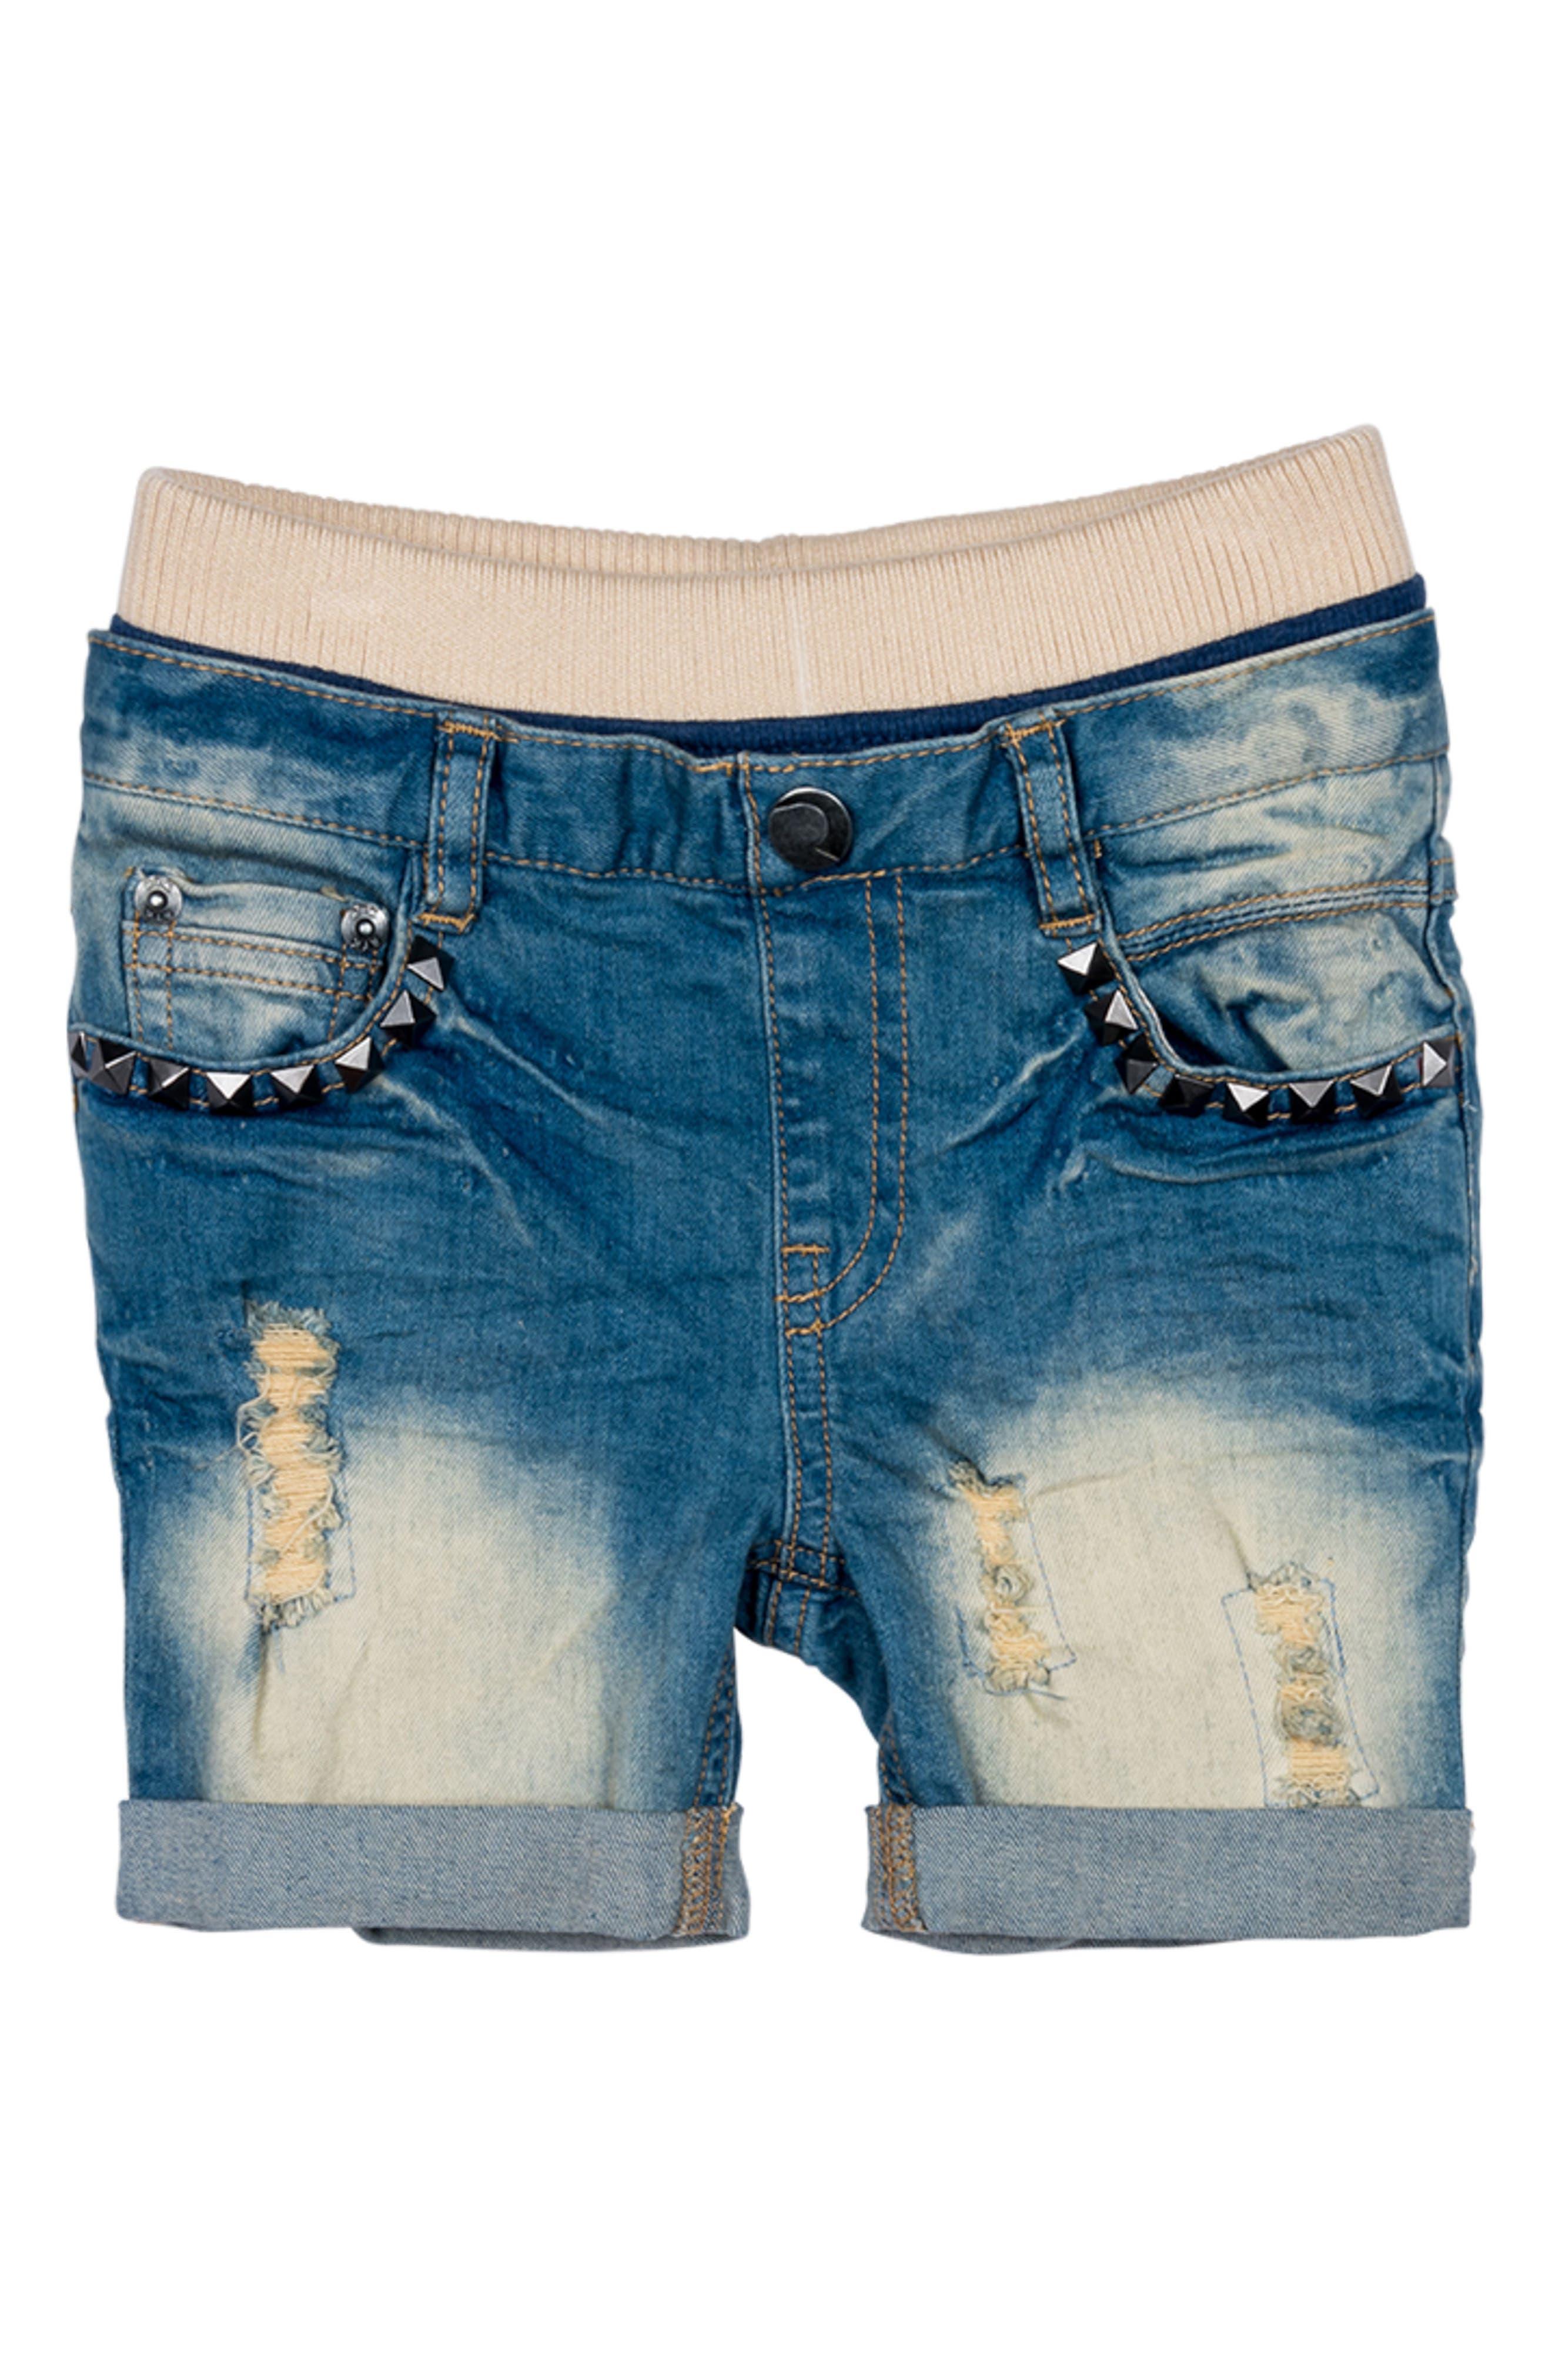 Heavy Metal Denim Shorts,                         Main,                         color, 400